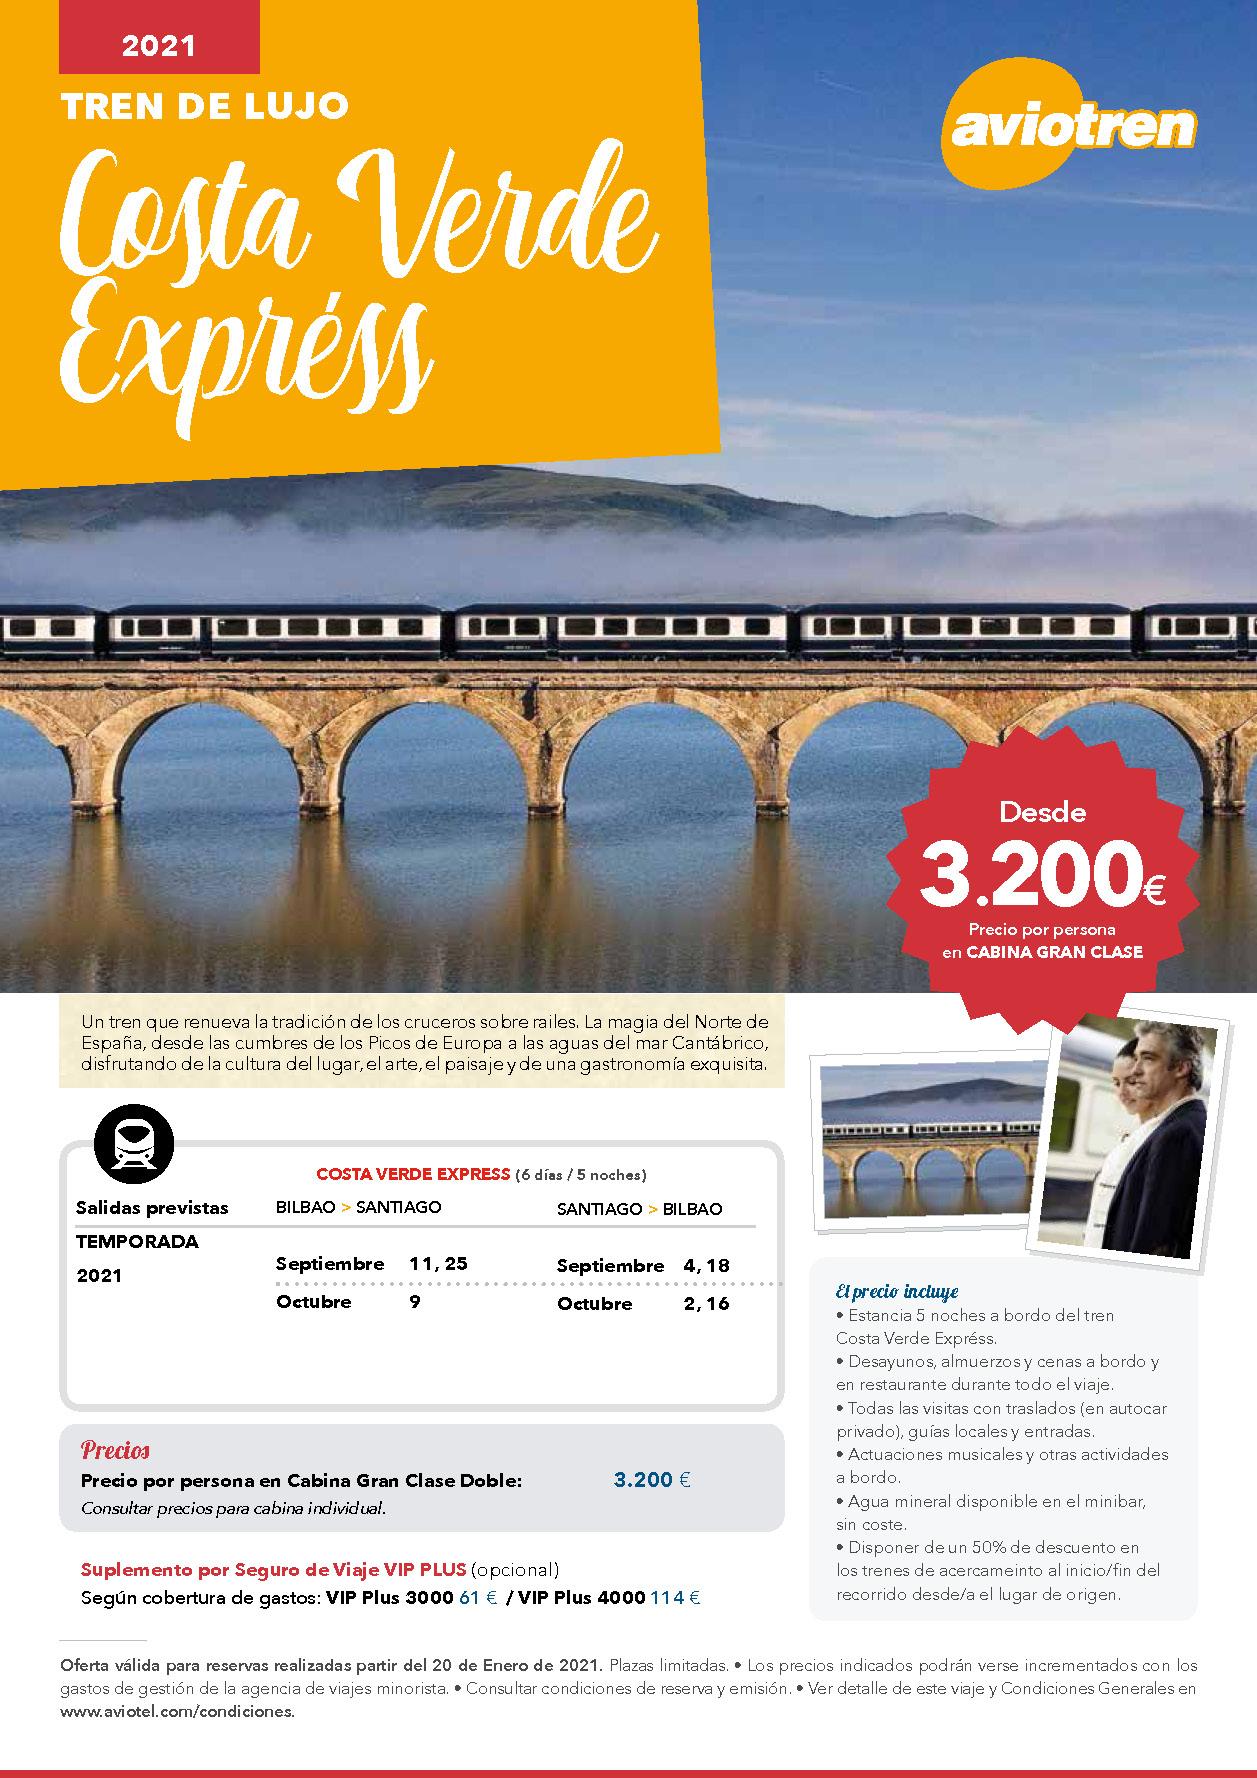 Oferta Aviotel Tren de Lujo Costa Verde Express 2021